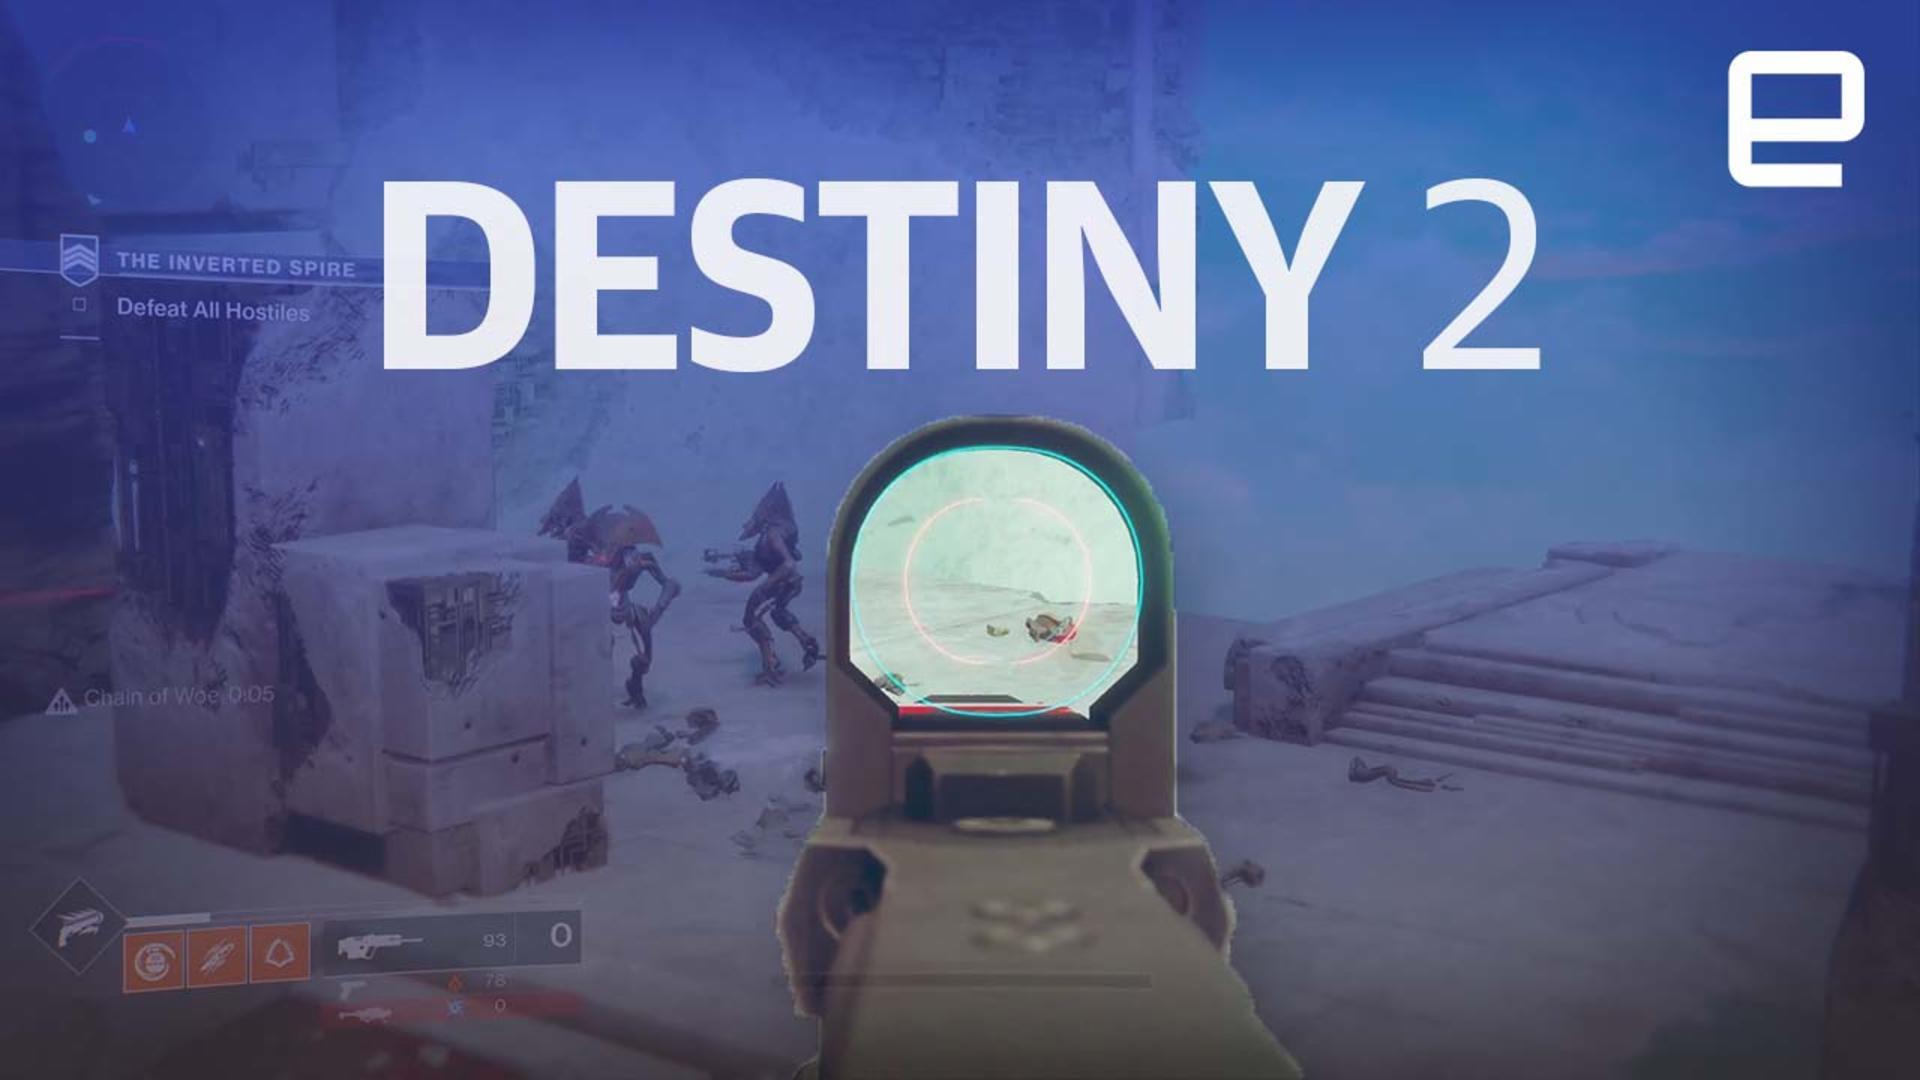 'Destiny 2' has the fundamentals to be a solid sequel